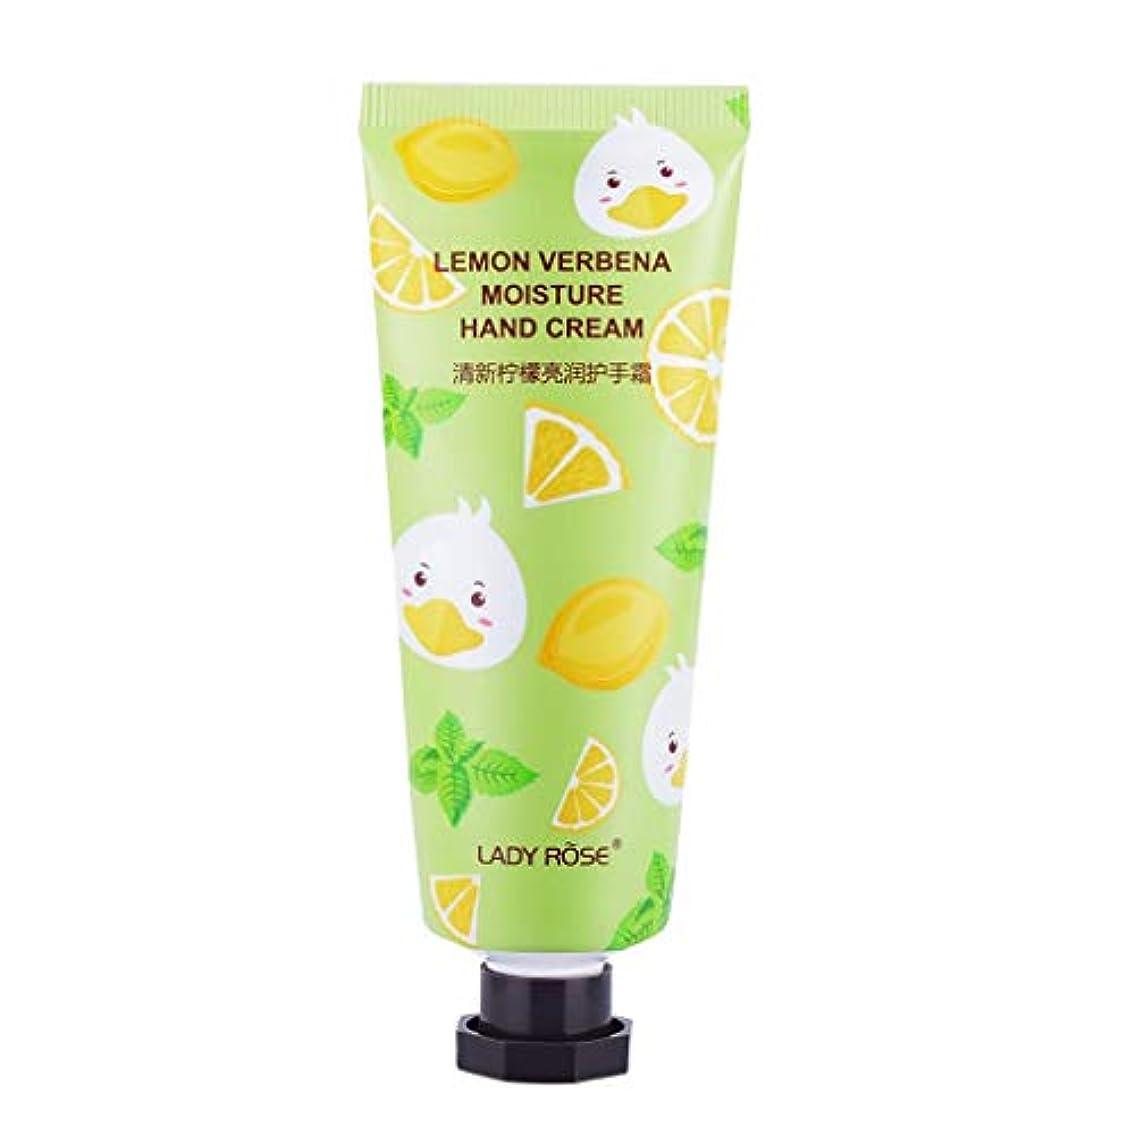 F Fityle ハンドクリーム 乾燥対策 潤い スキンケア 可愛い 香り 保湿クリーム ローション 3タイプ選べ - レモン